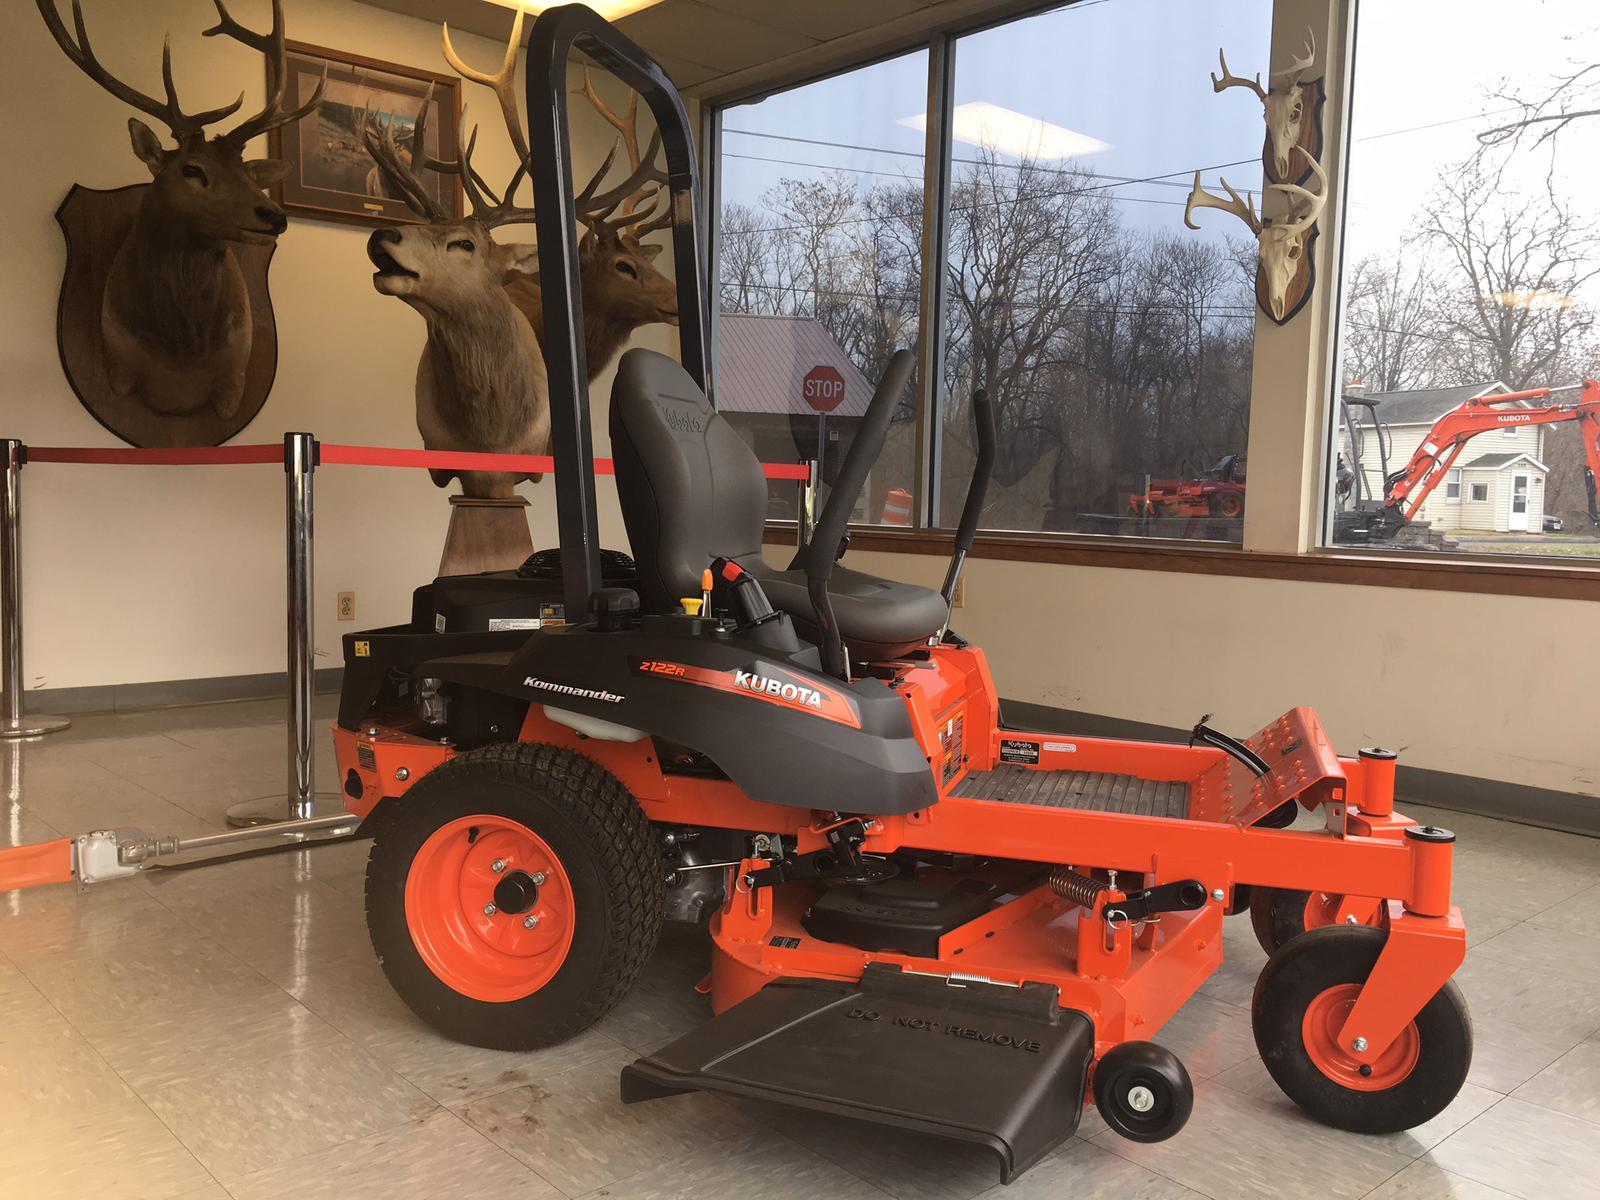 2018 Kubota Z122RKW-42 for sale in Palmyra, NY. John S. Blazey Inc ...